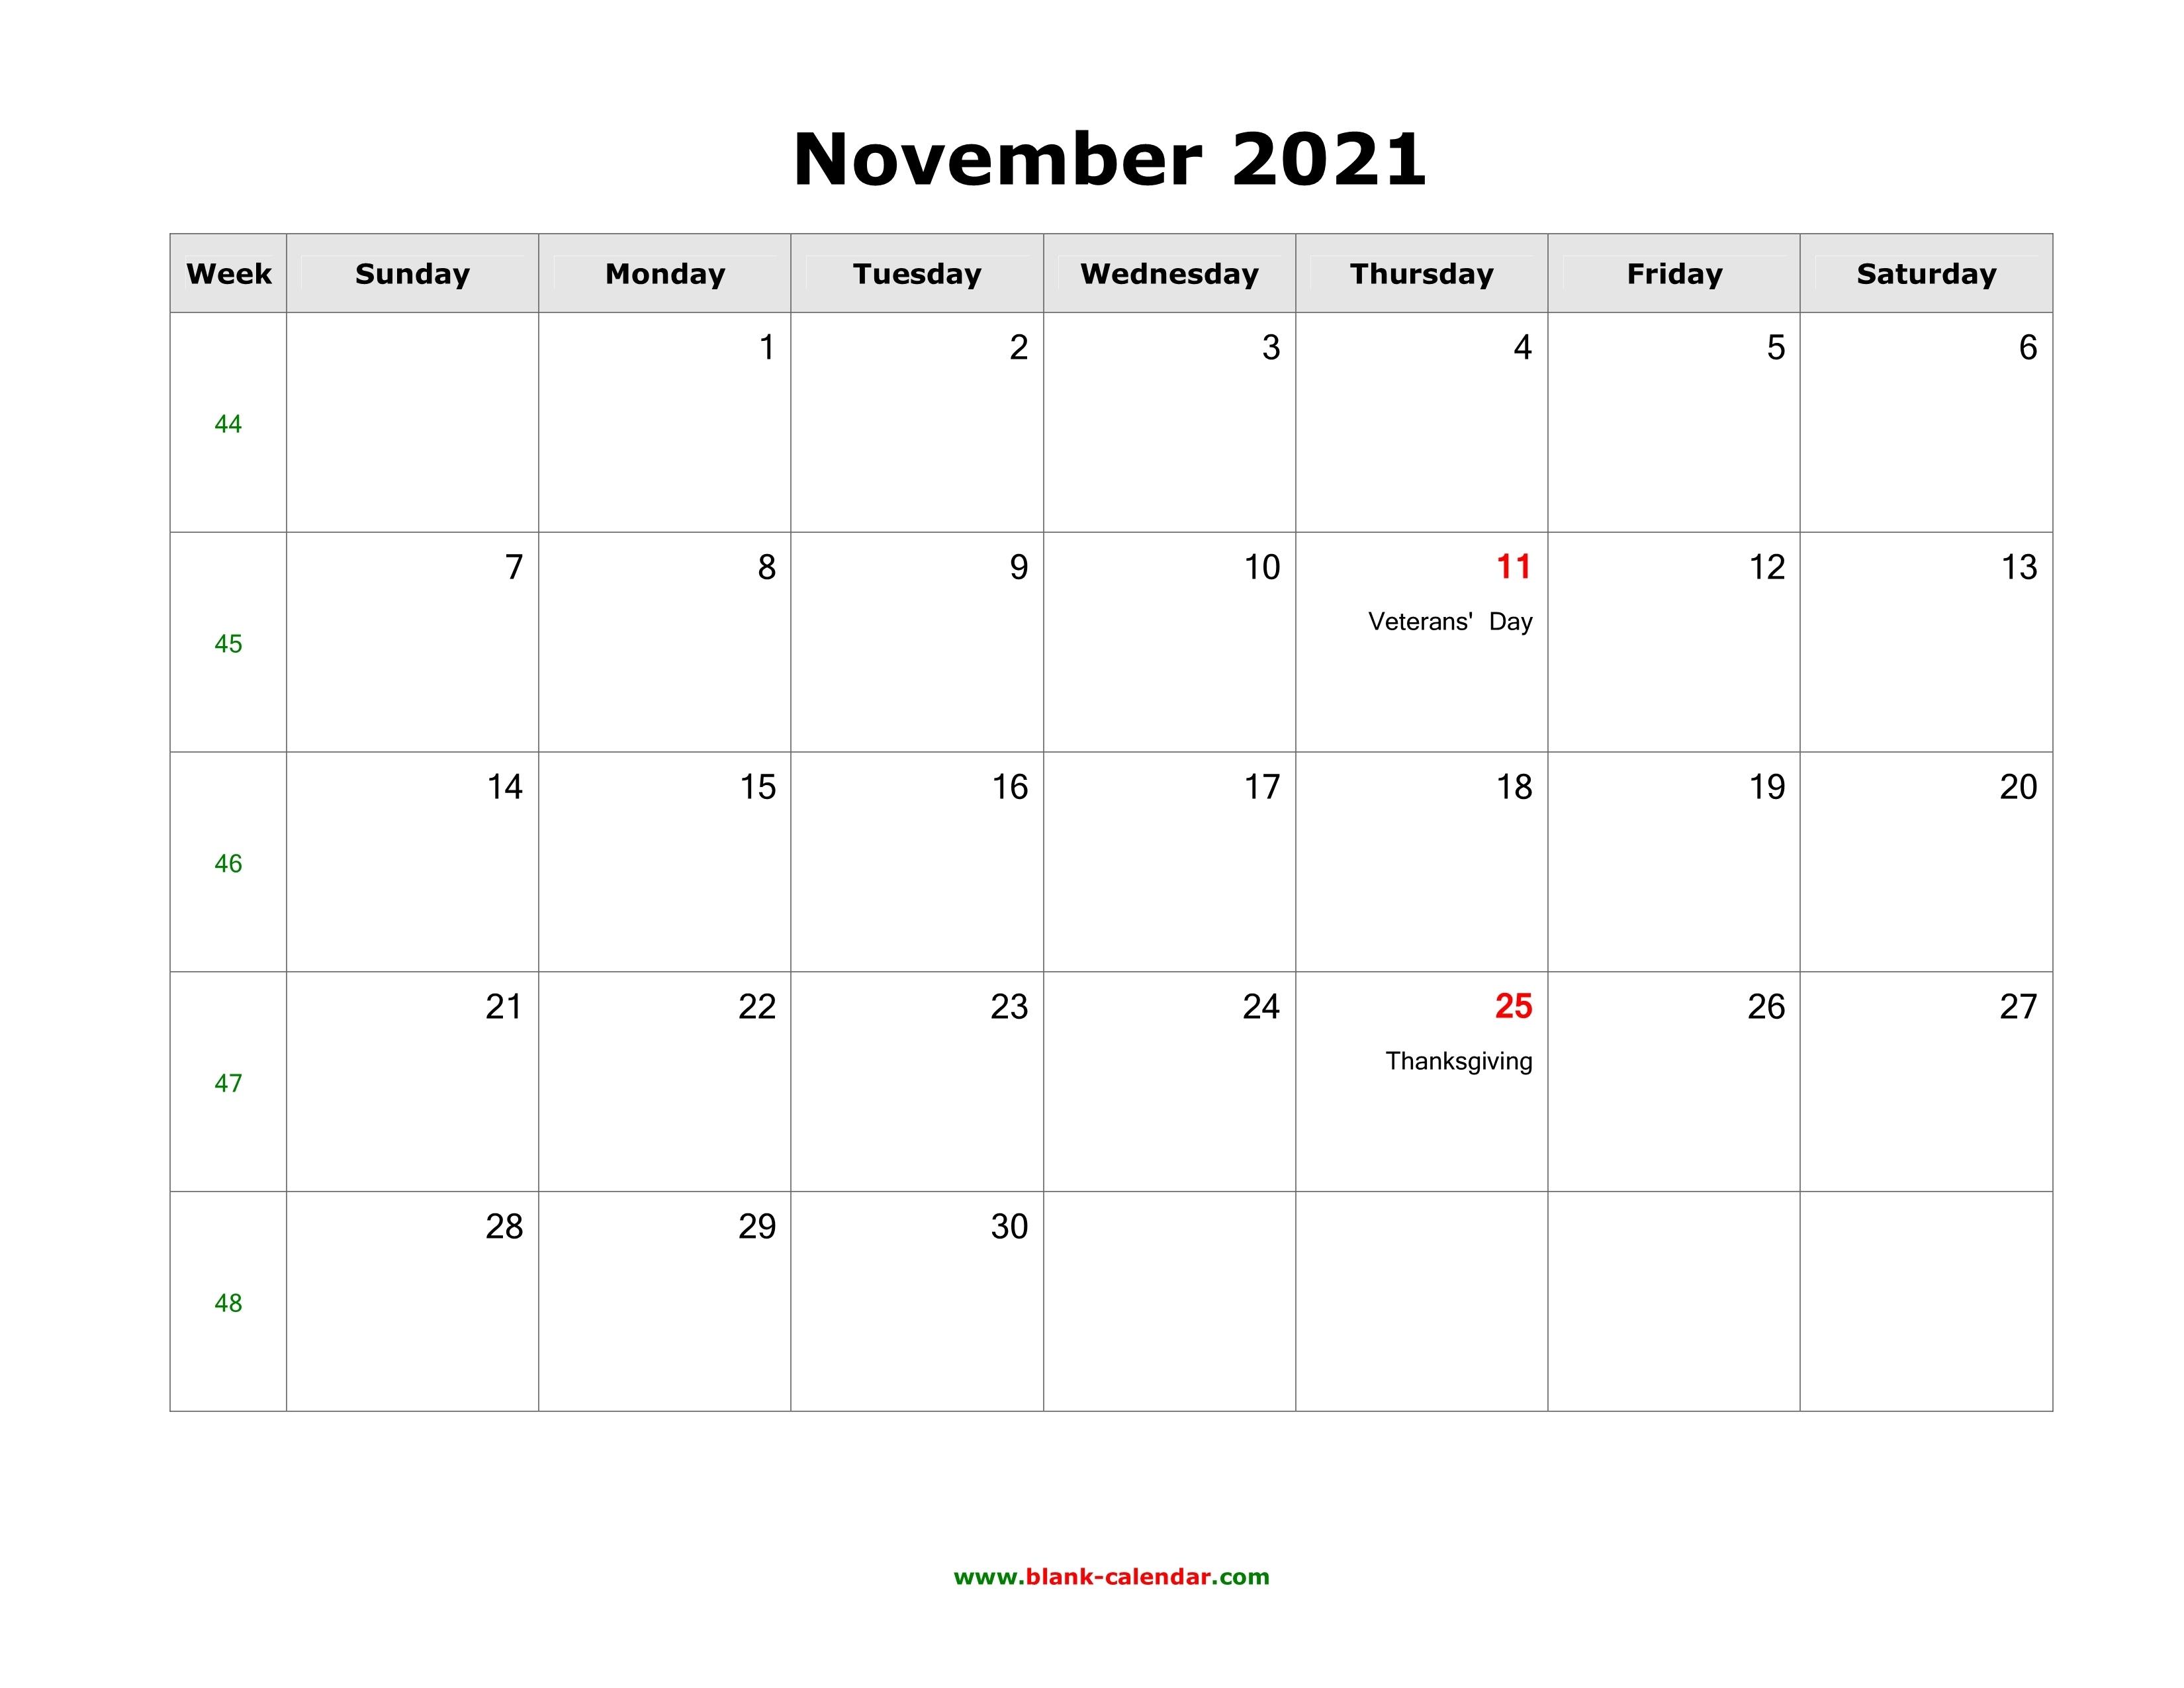 November 2021 Blank Calendar | Free Download Calendar Templates November 2021 Calendar Quiz